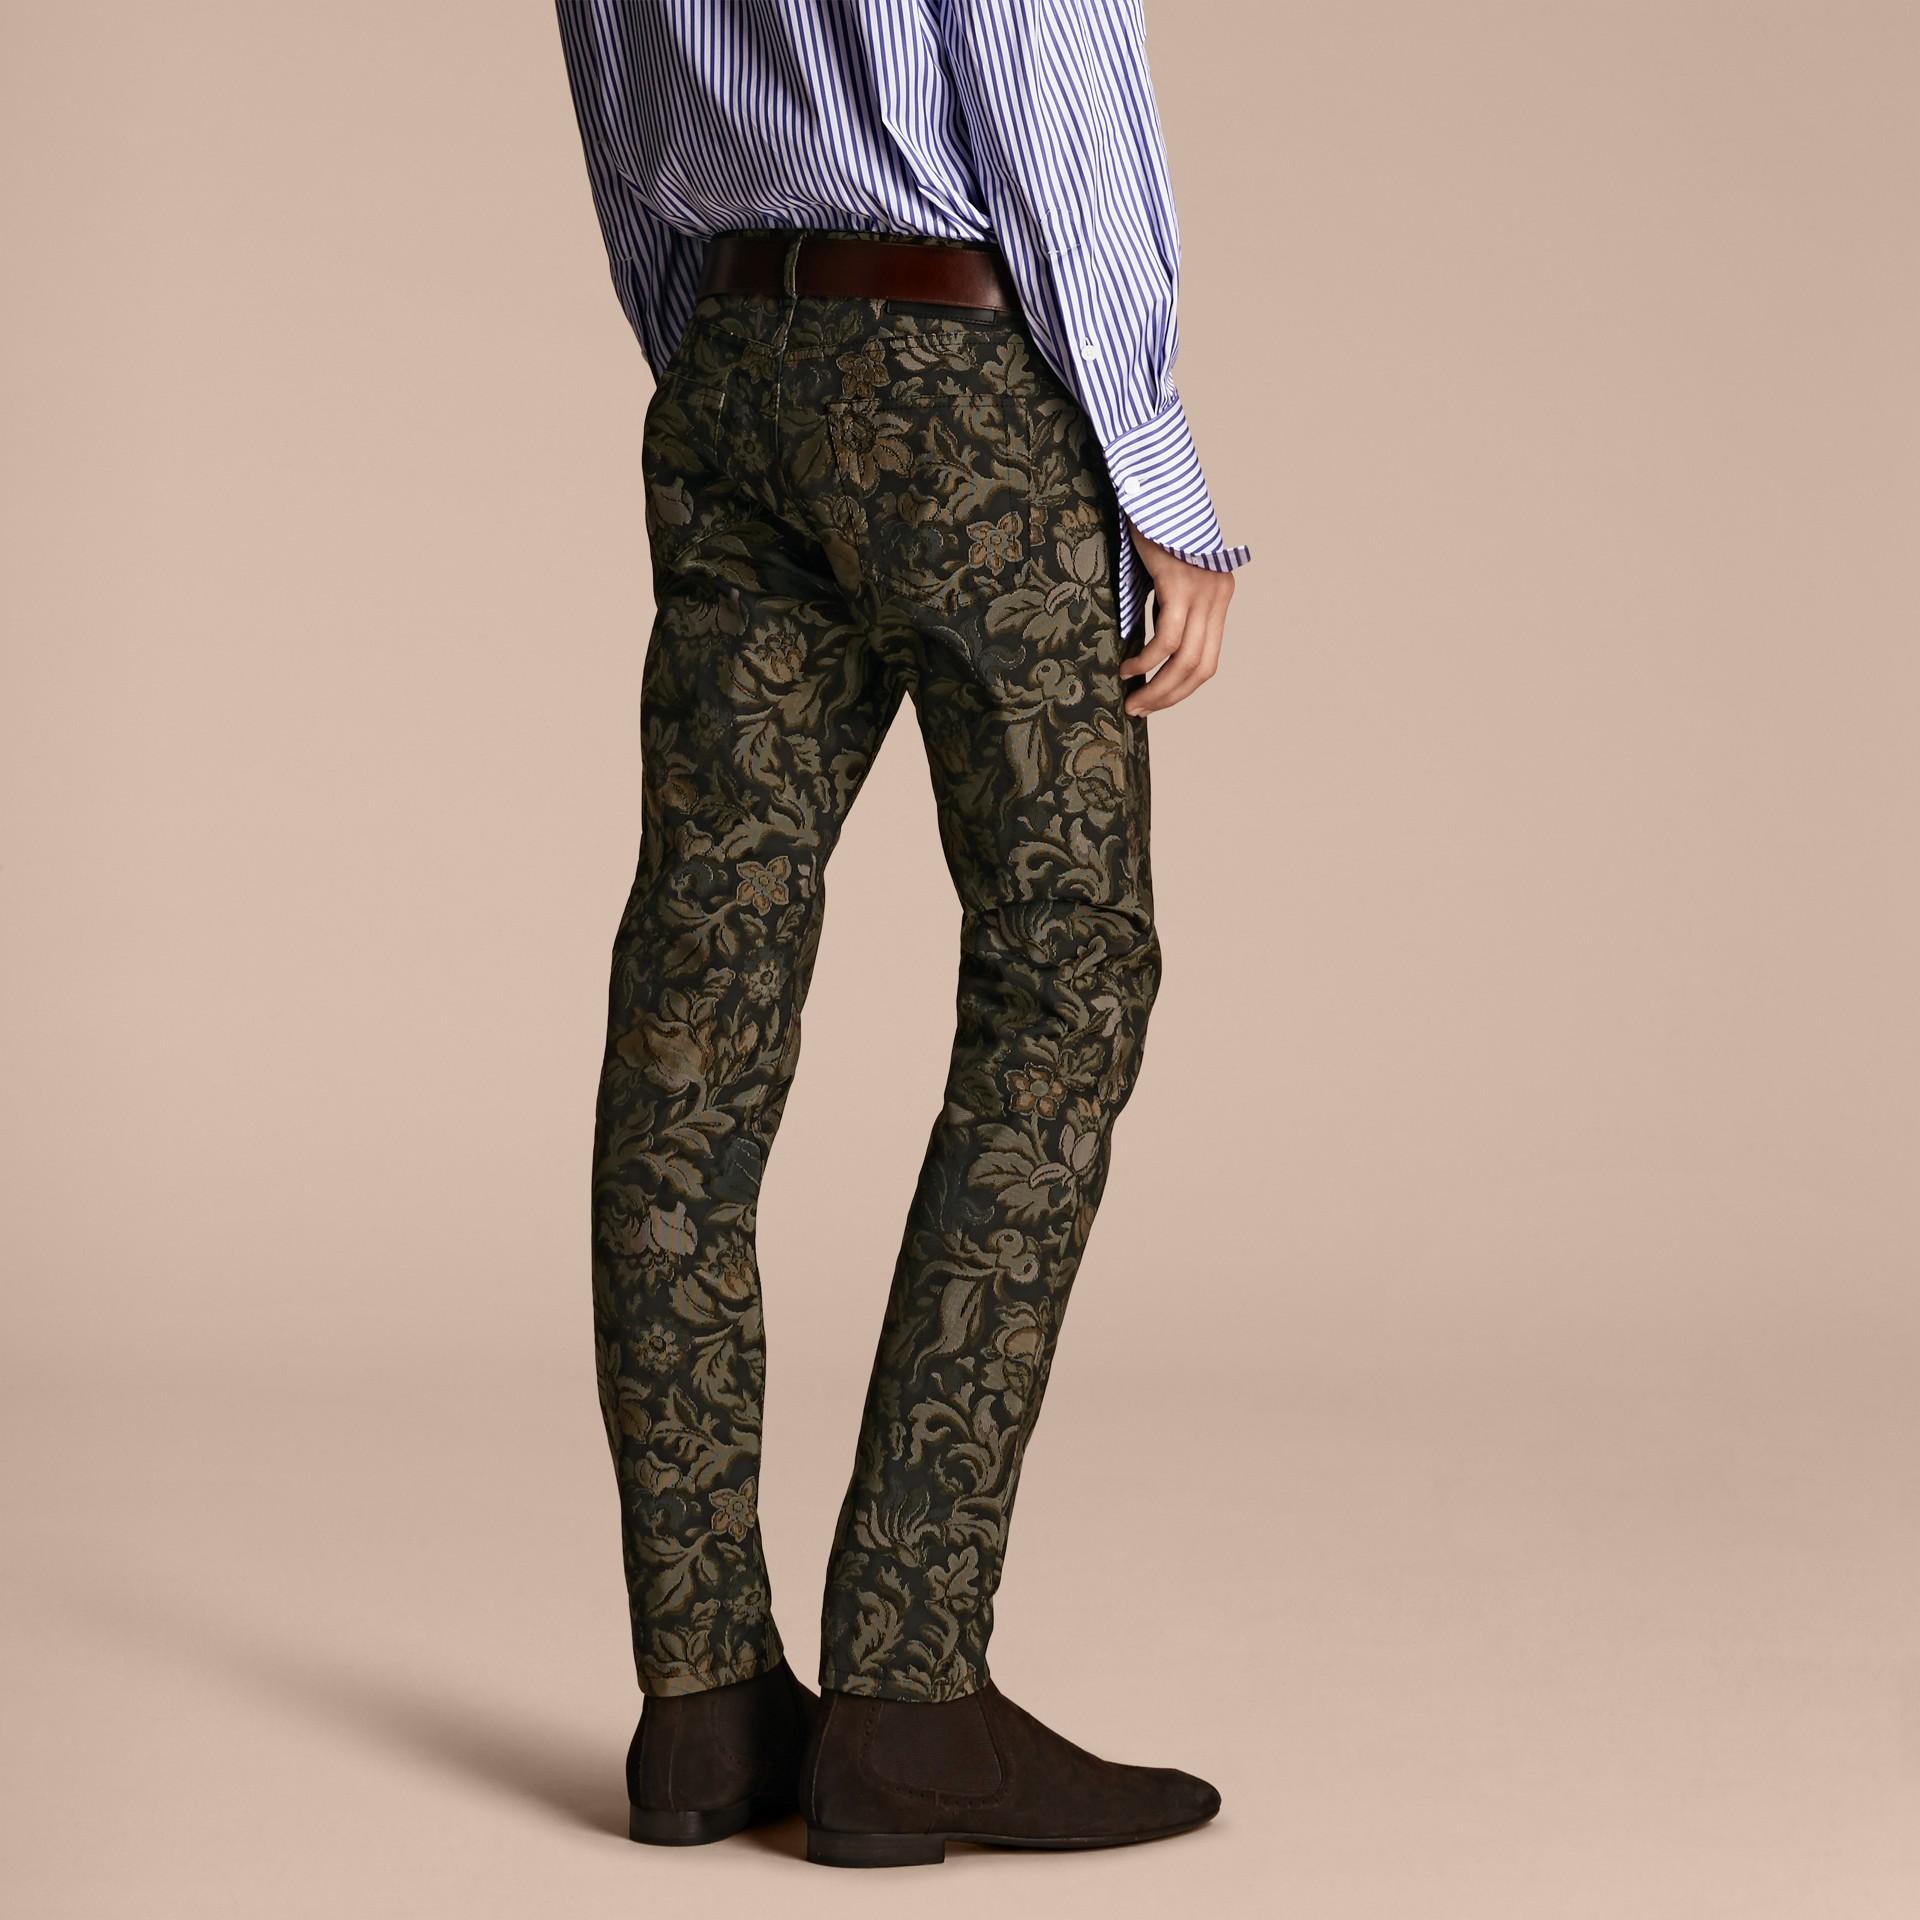 Sage Slim Fit Floral Jacquard Jeans Sage - gallery image 3